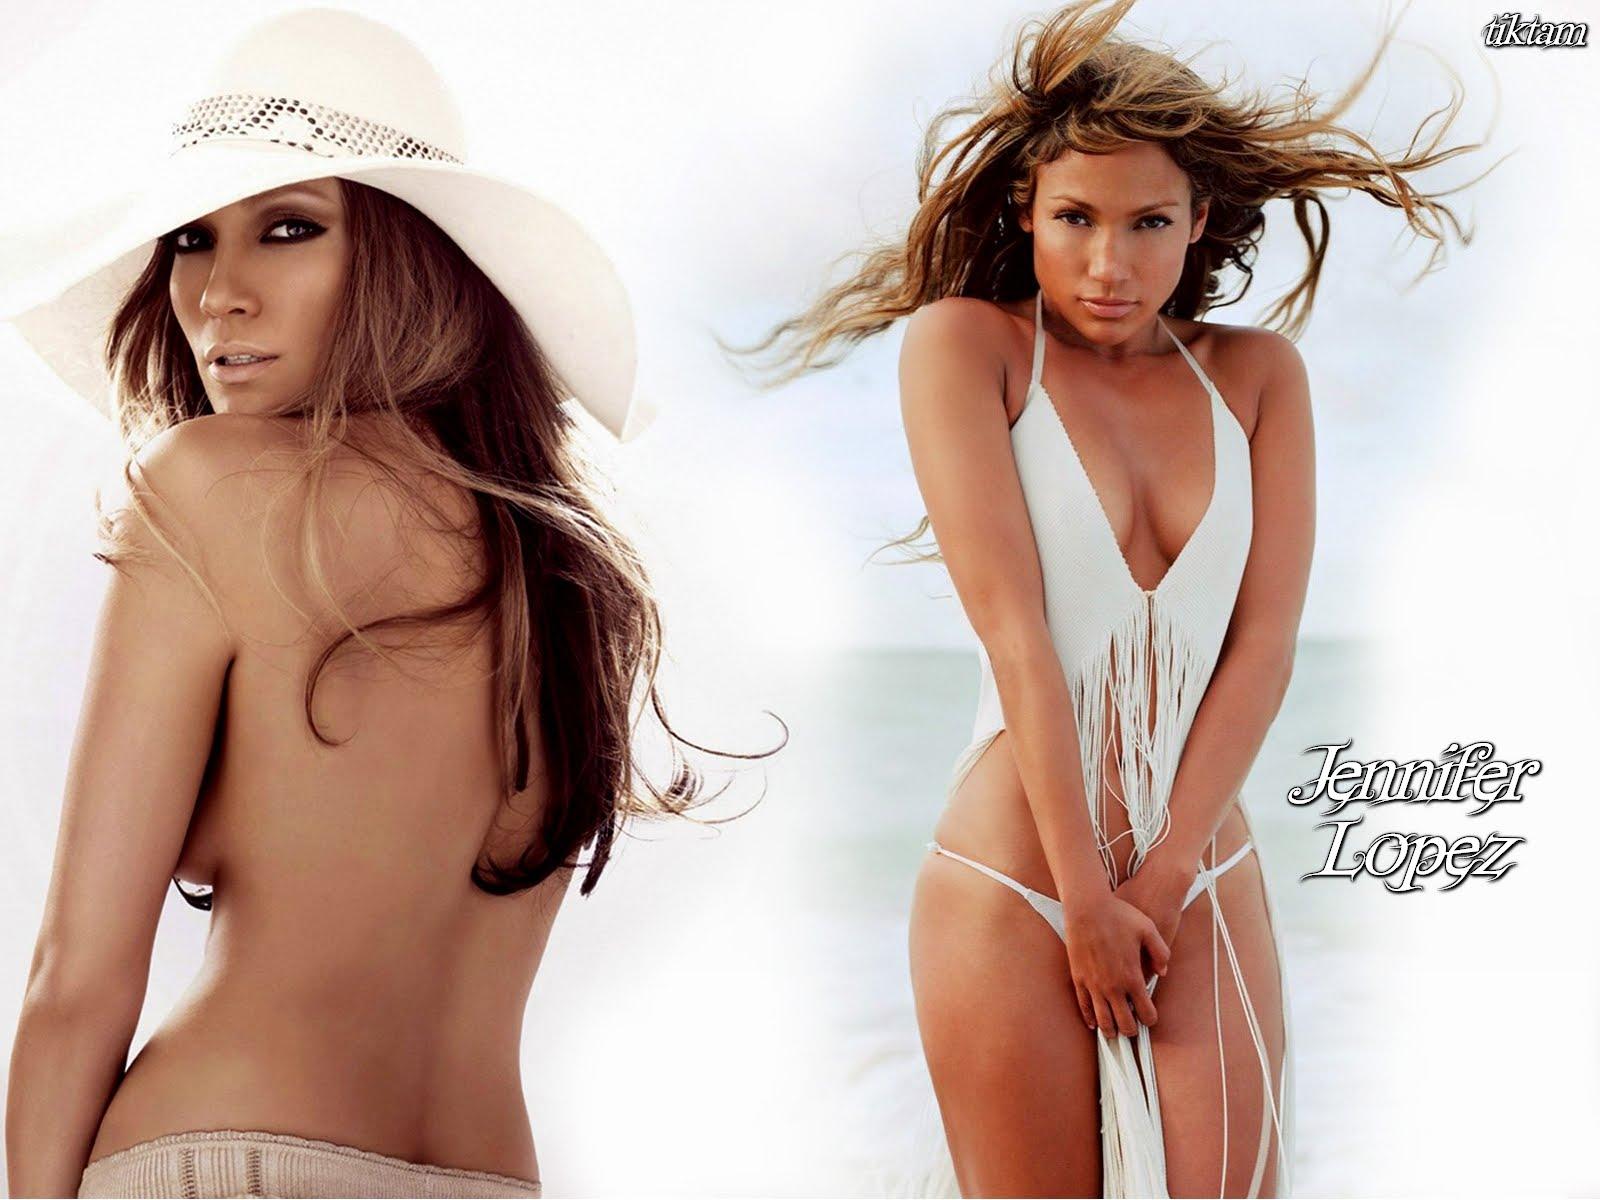 http://1.bp.blogspot.com/_N9_mRzq5wZc/THLAgSbjfdI/AAAAAAAAATY/UuB890A5SOw/s1600/Jennifer-Lopez-jennifer-lopez-43913_1600_1200.jpg